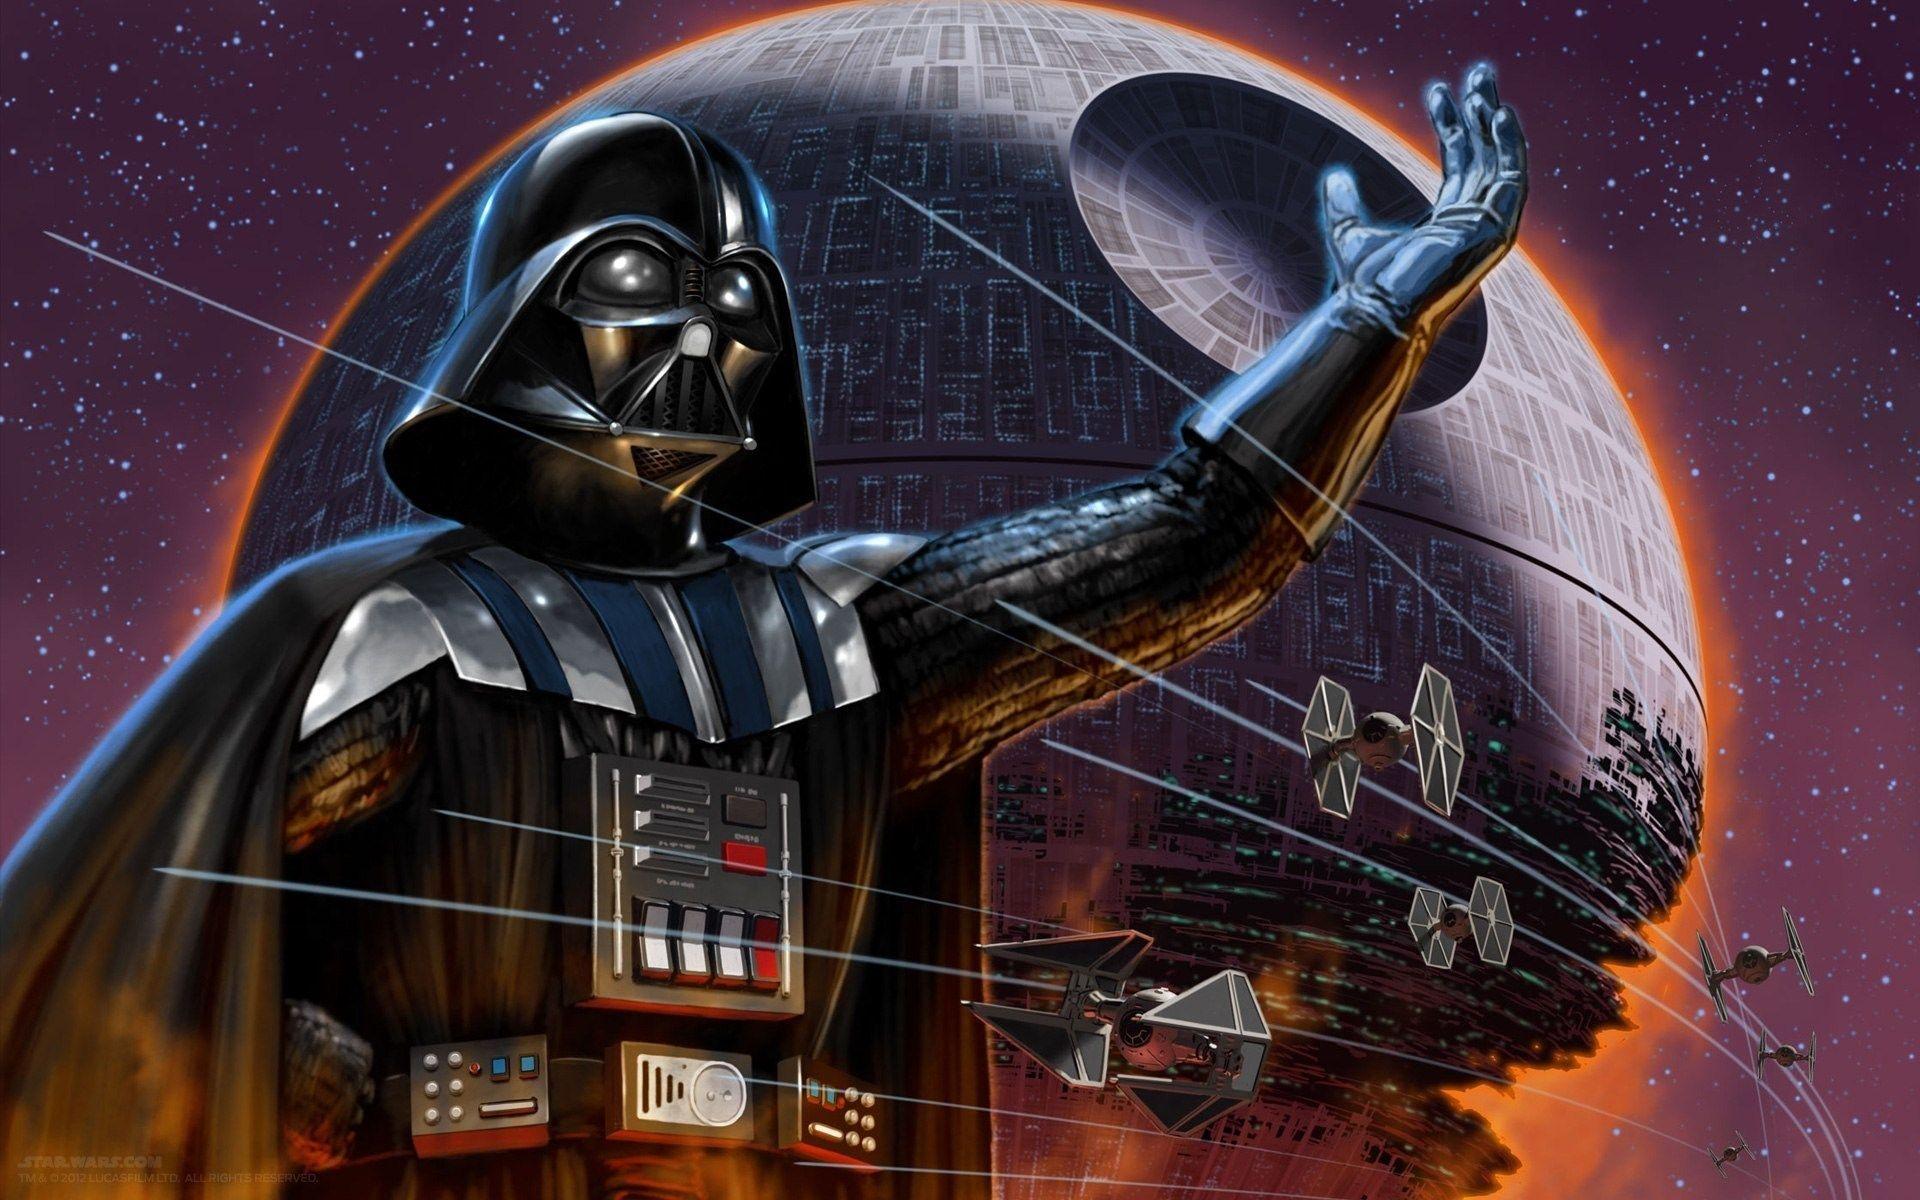 Widescreen Wallpaper Star Wars 1920x1200 397 KB